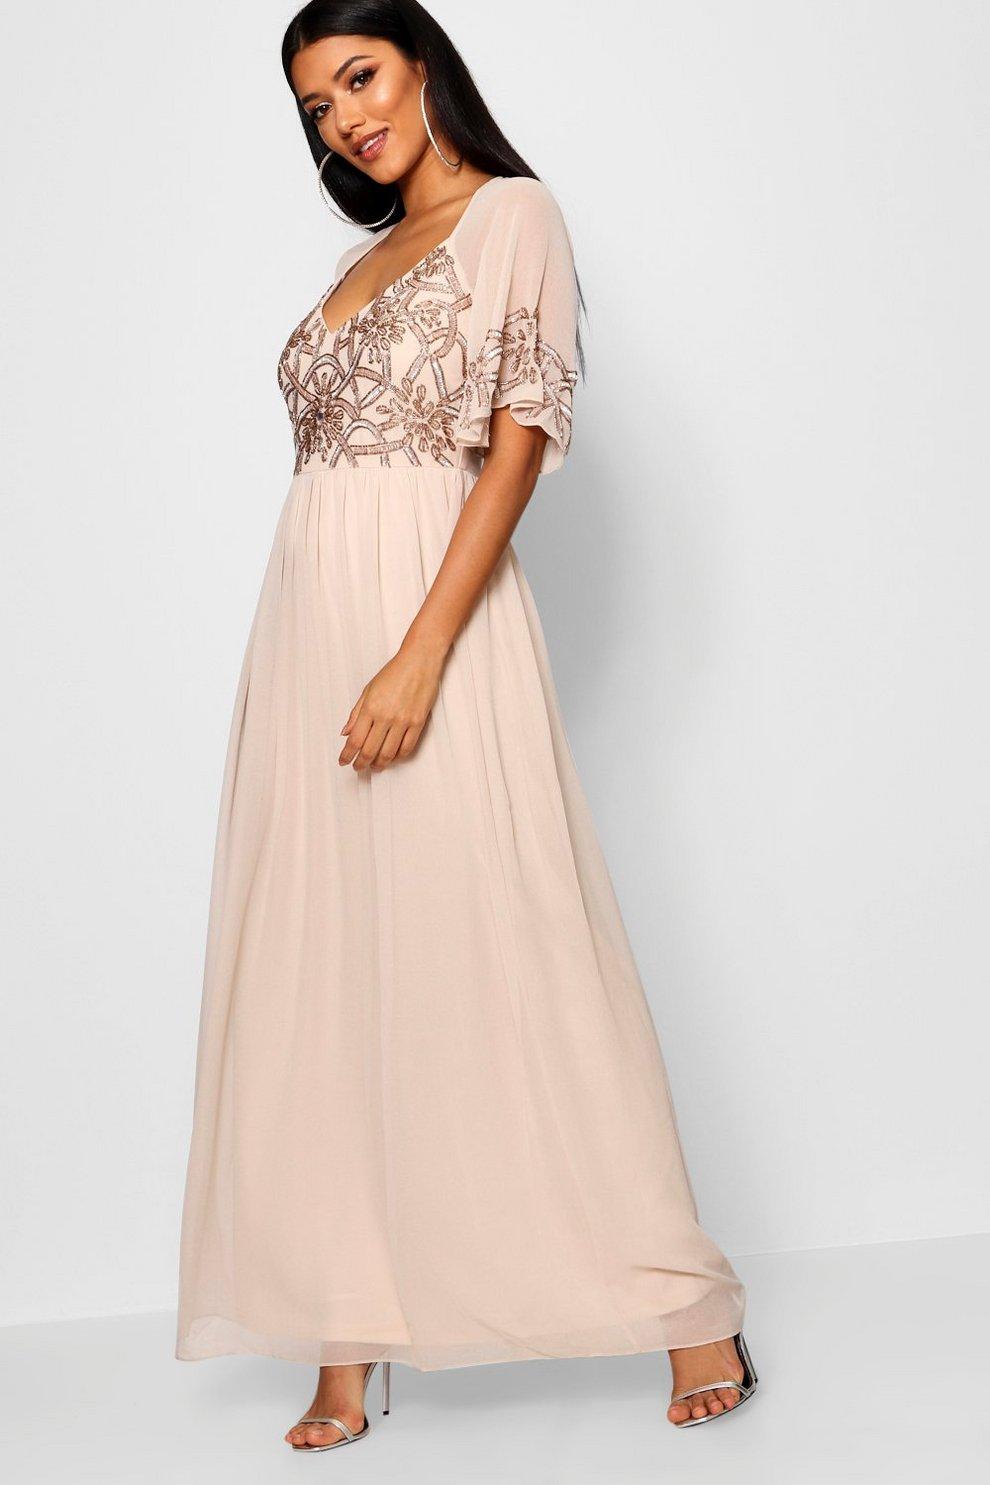 cc8139e8fc4 Boutique Embellished Maxi Dress